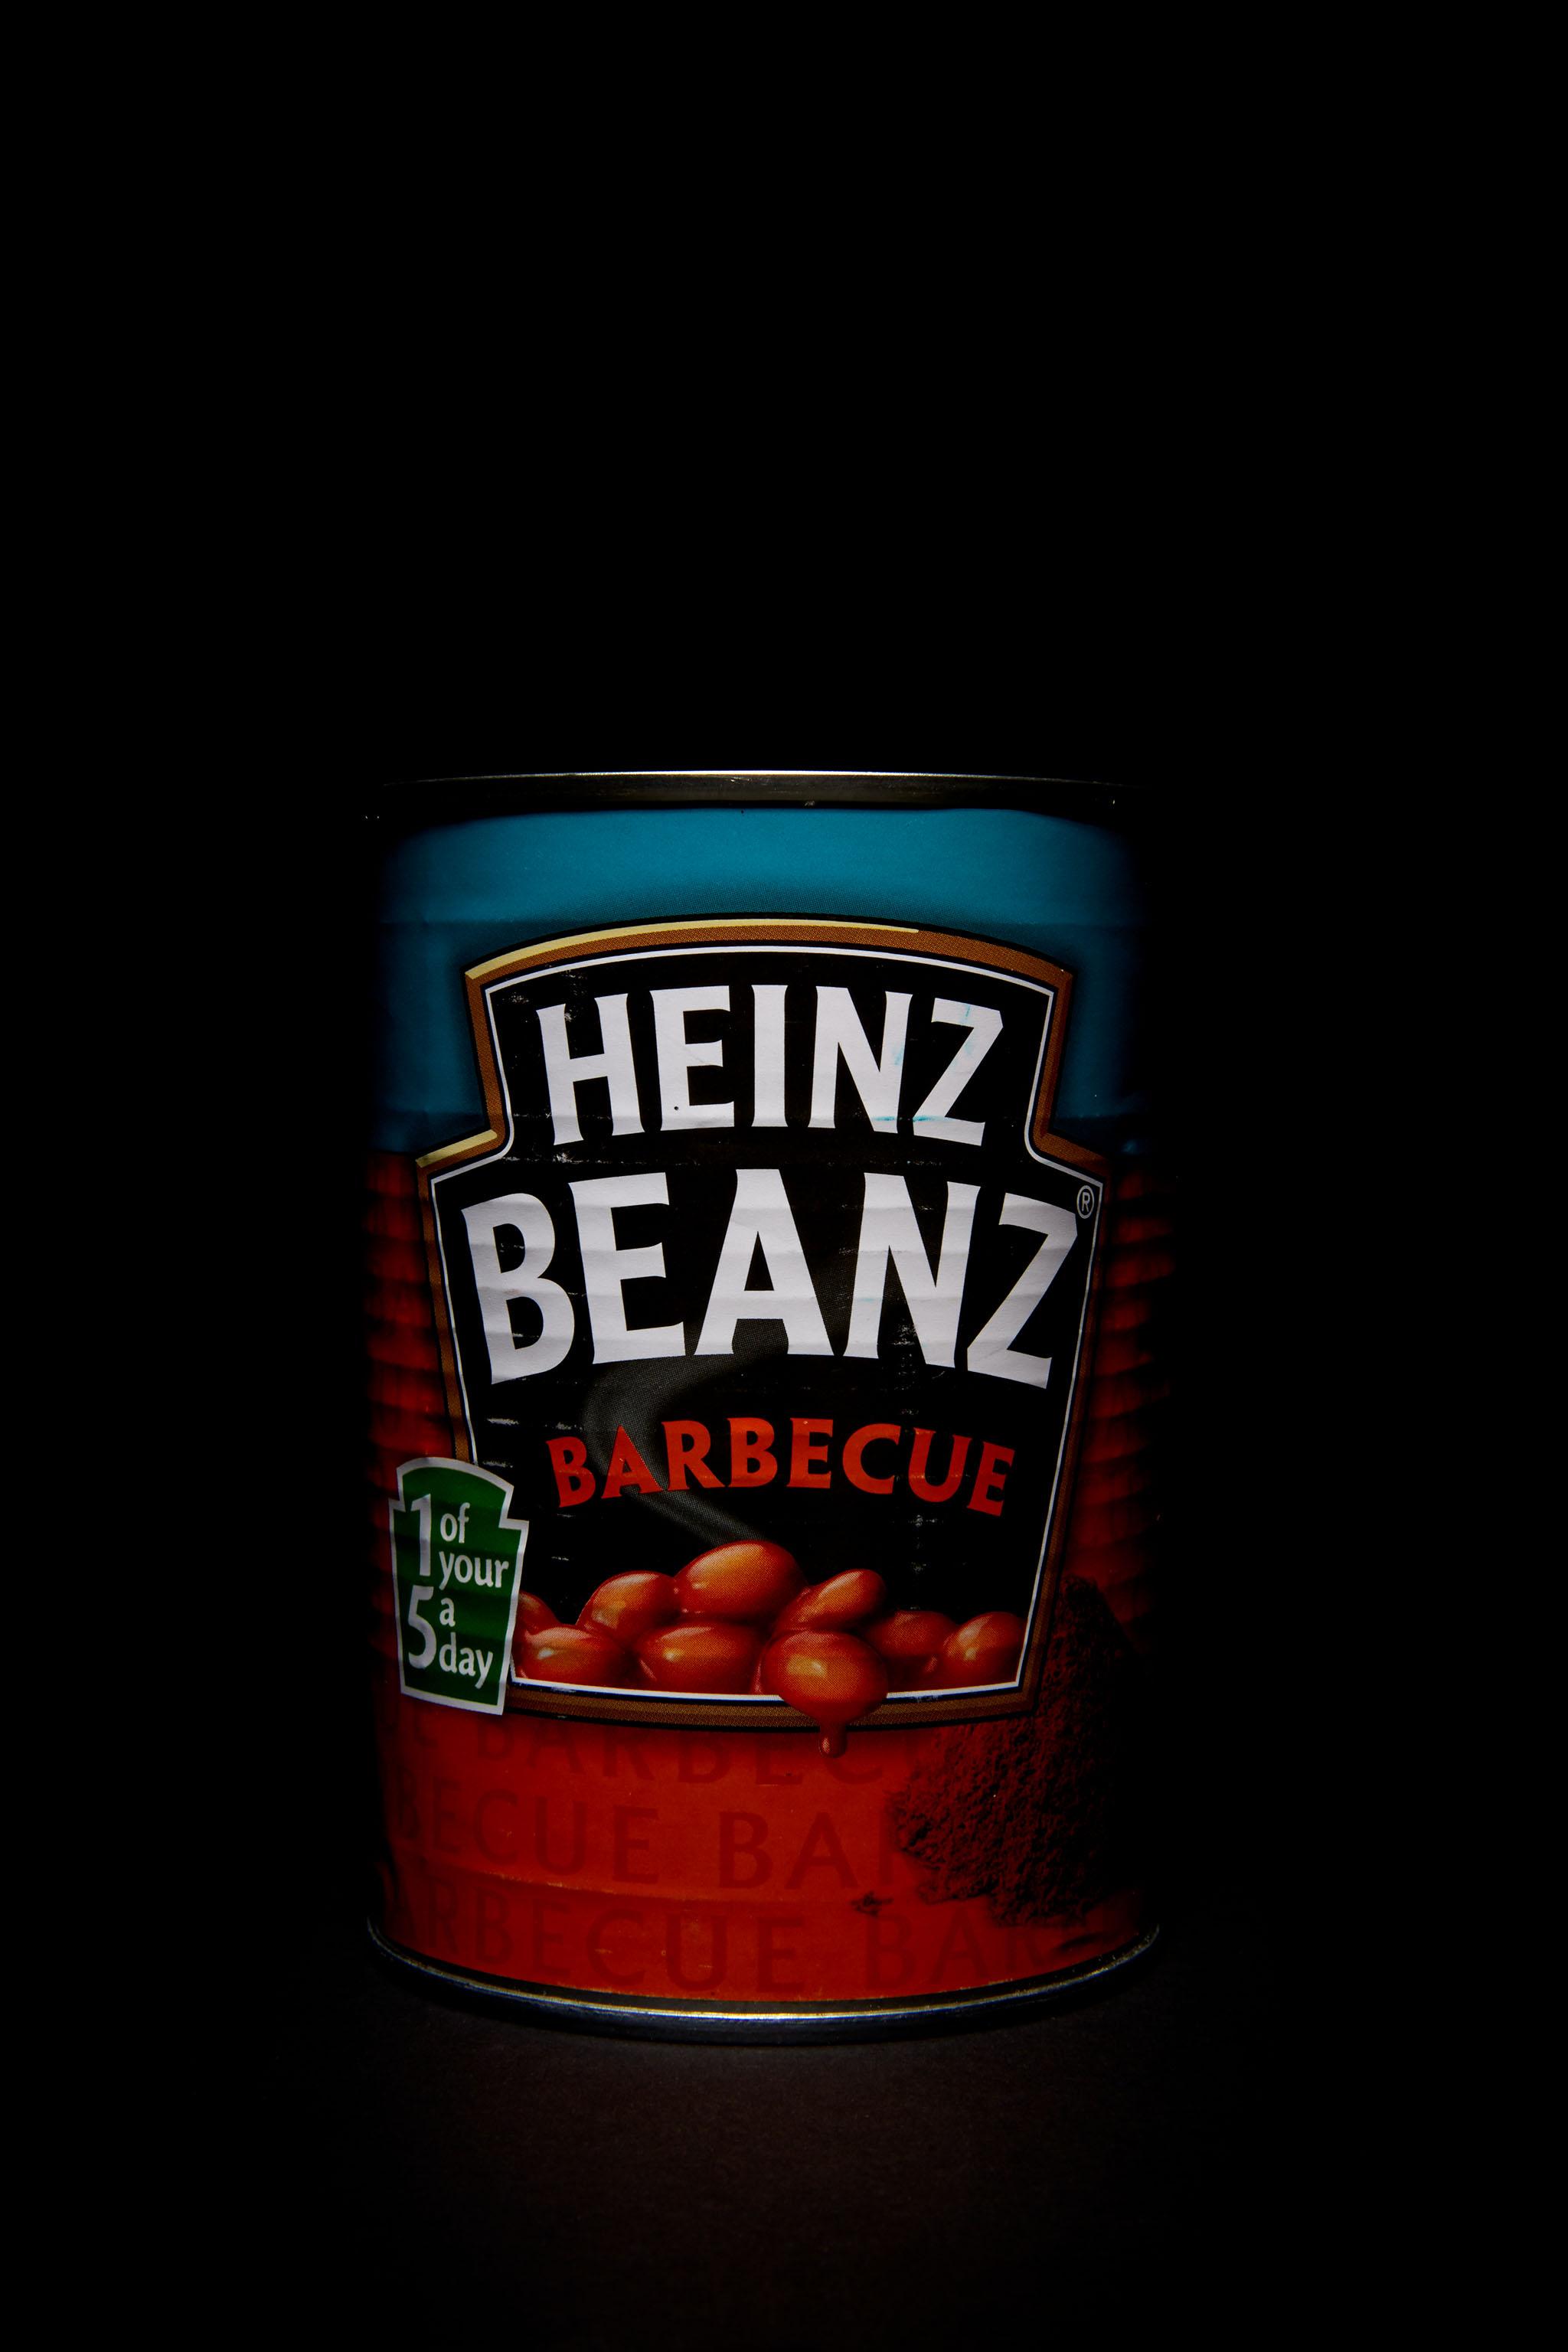 Heinz / Personal work